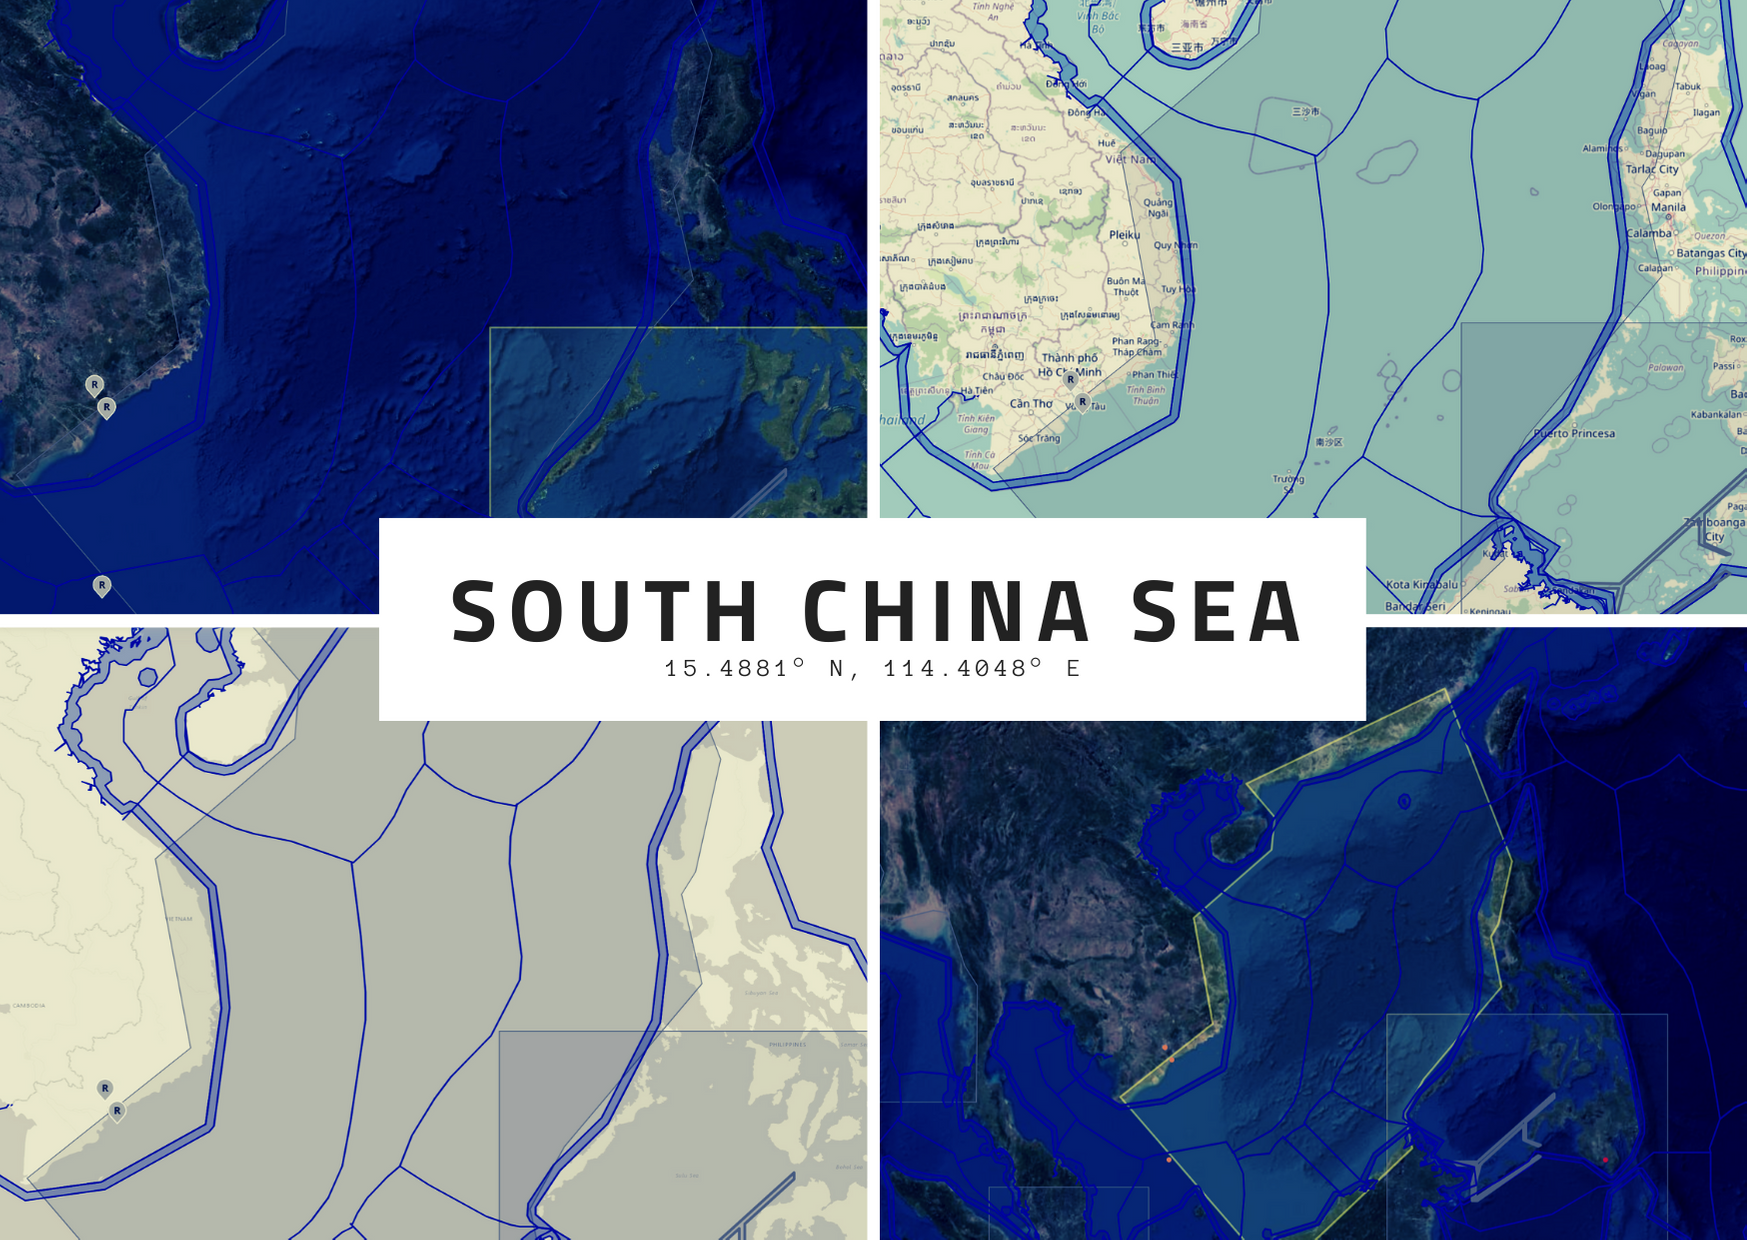 South China Sea-1